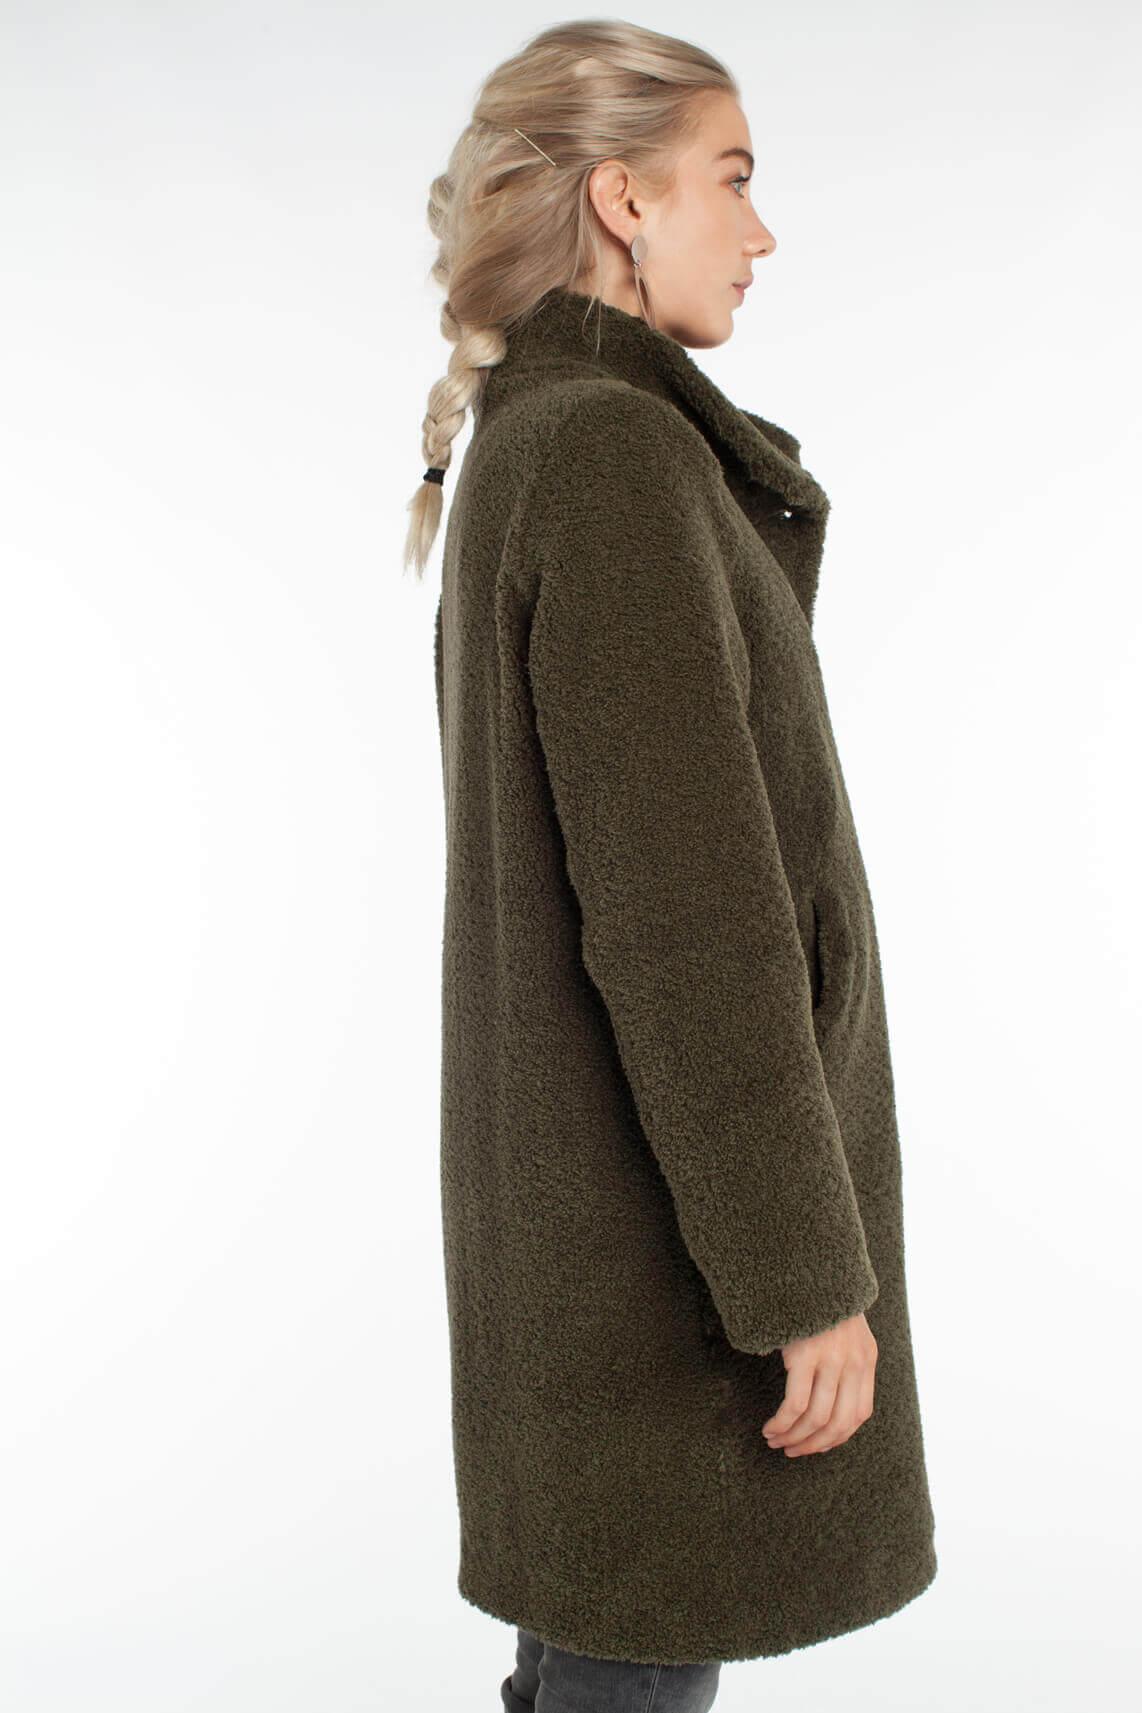 Beaumont Dames Teddy mantel groen